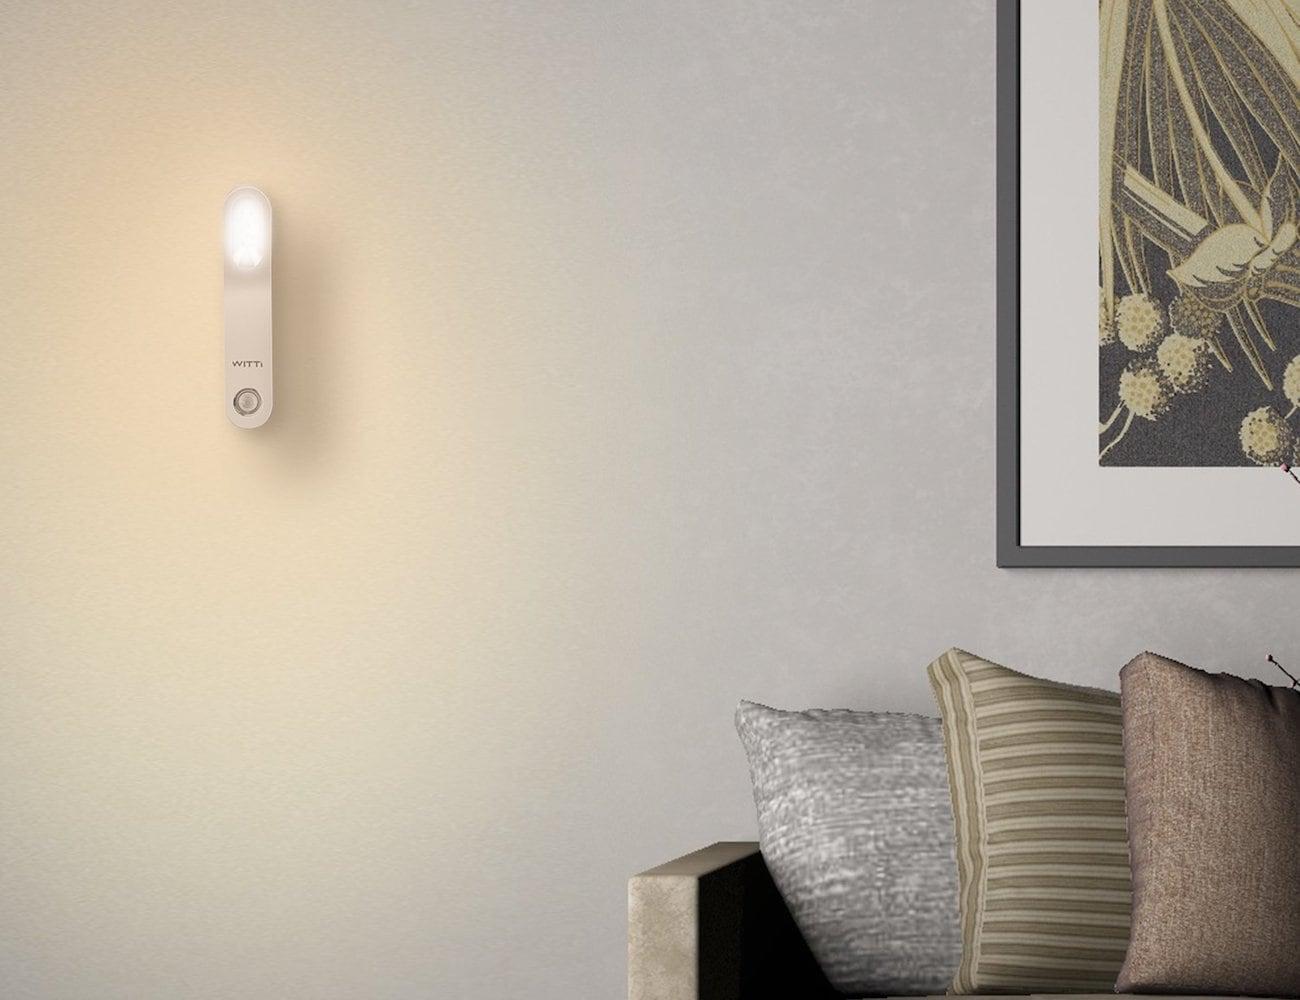 Witti HANDI Portable Motion Sensor Night Light